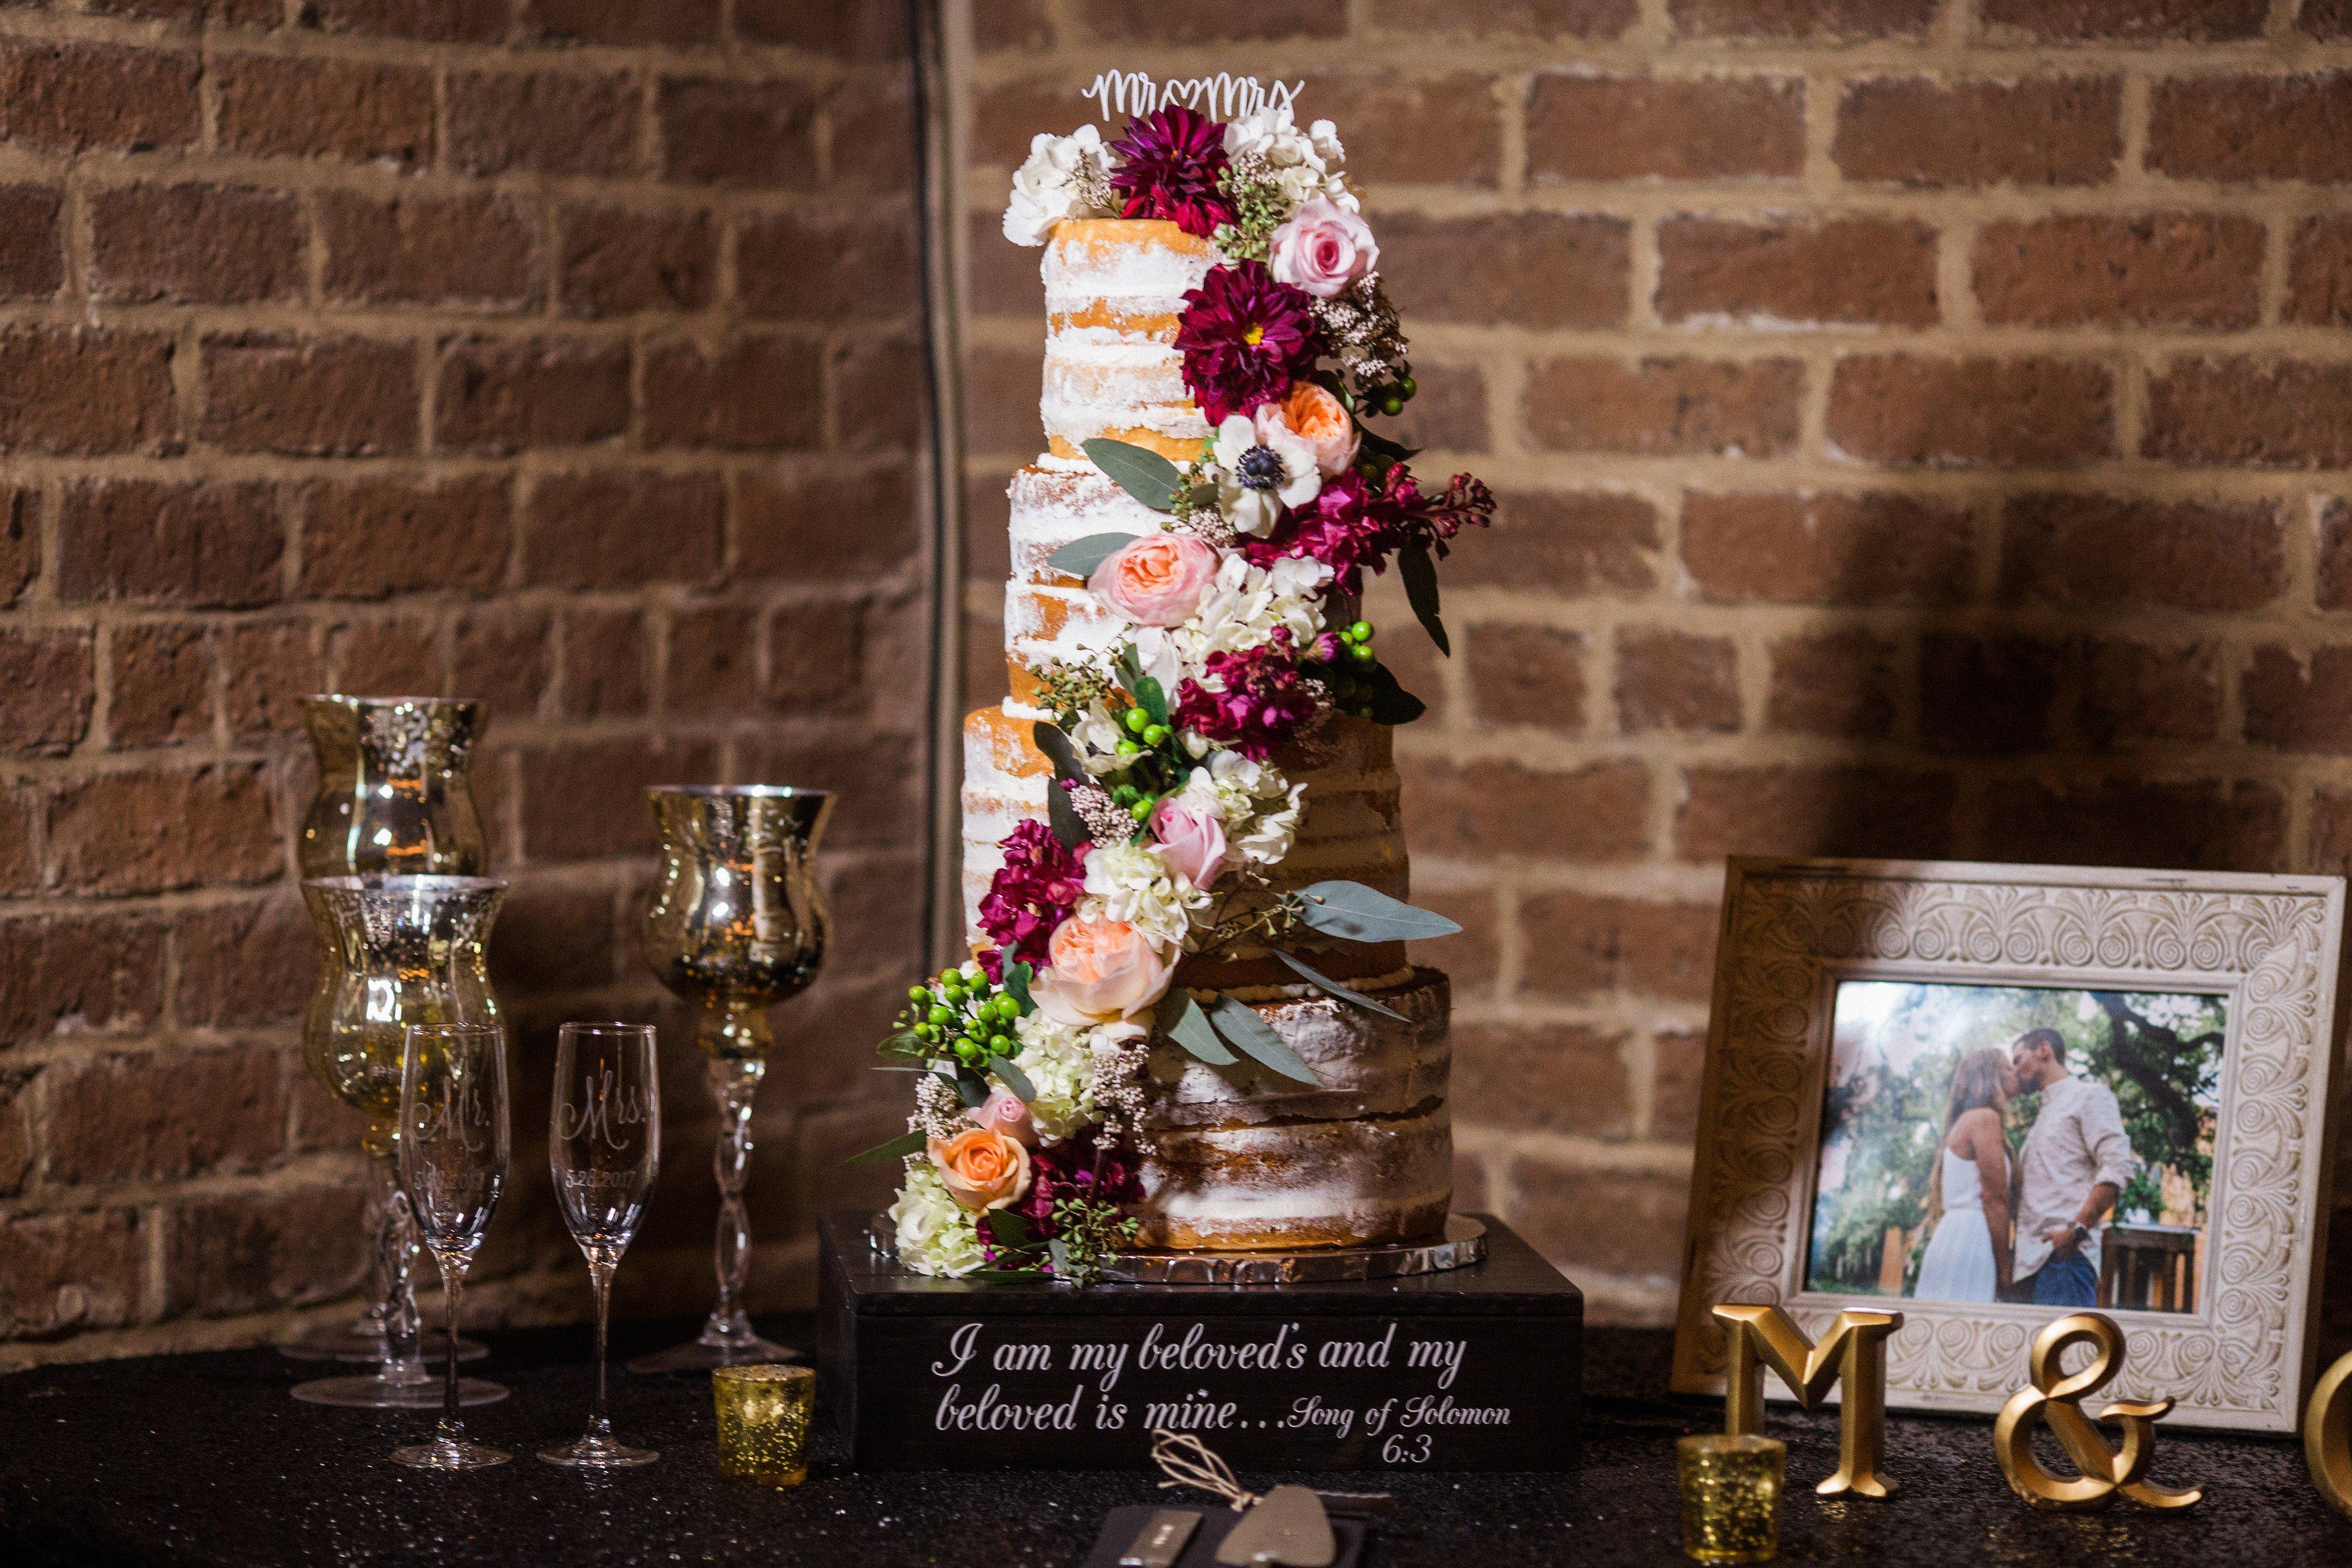 charles-morris-wedding-photo-mg(441).jpg